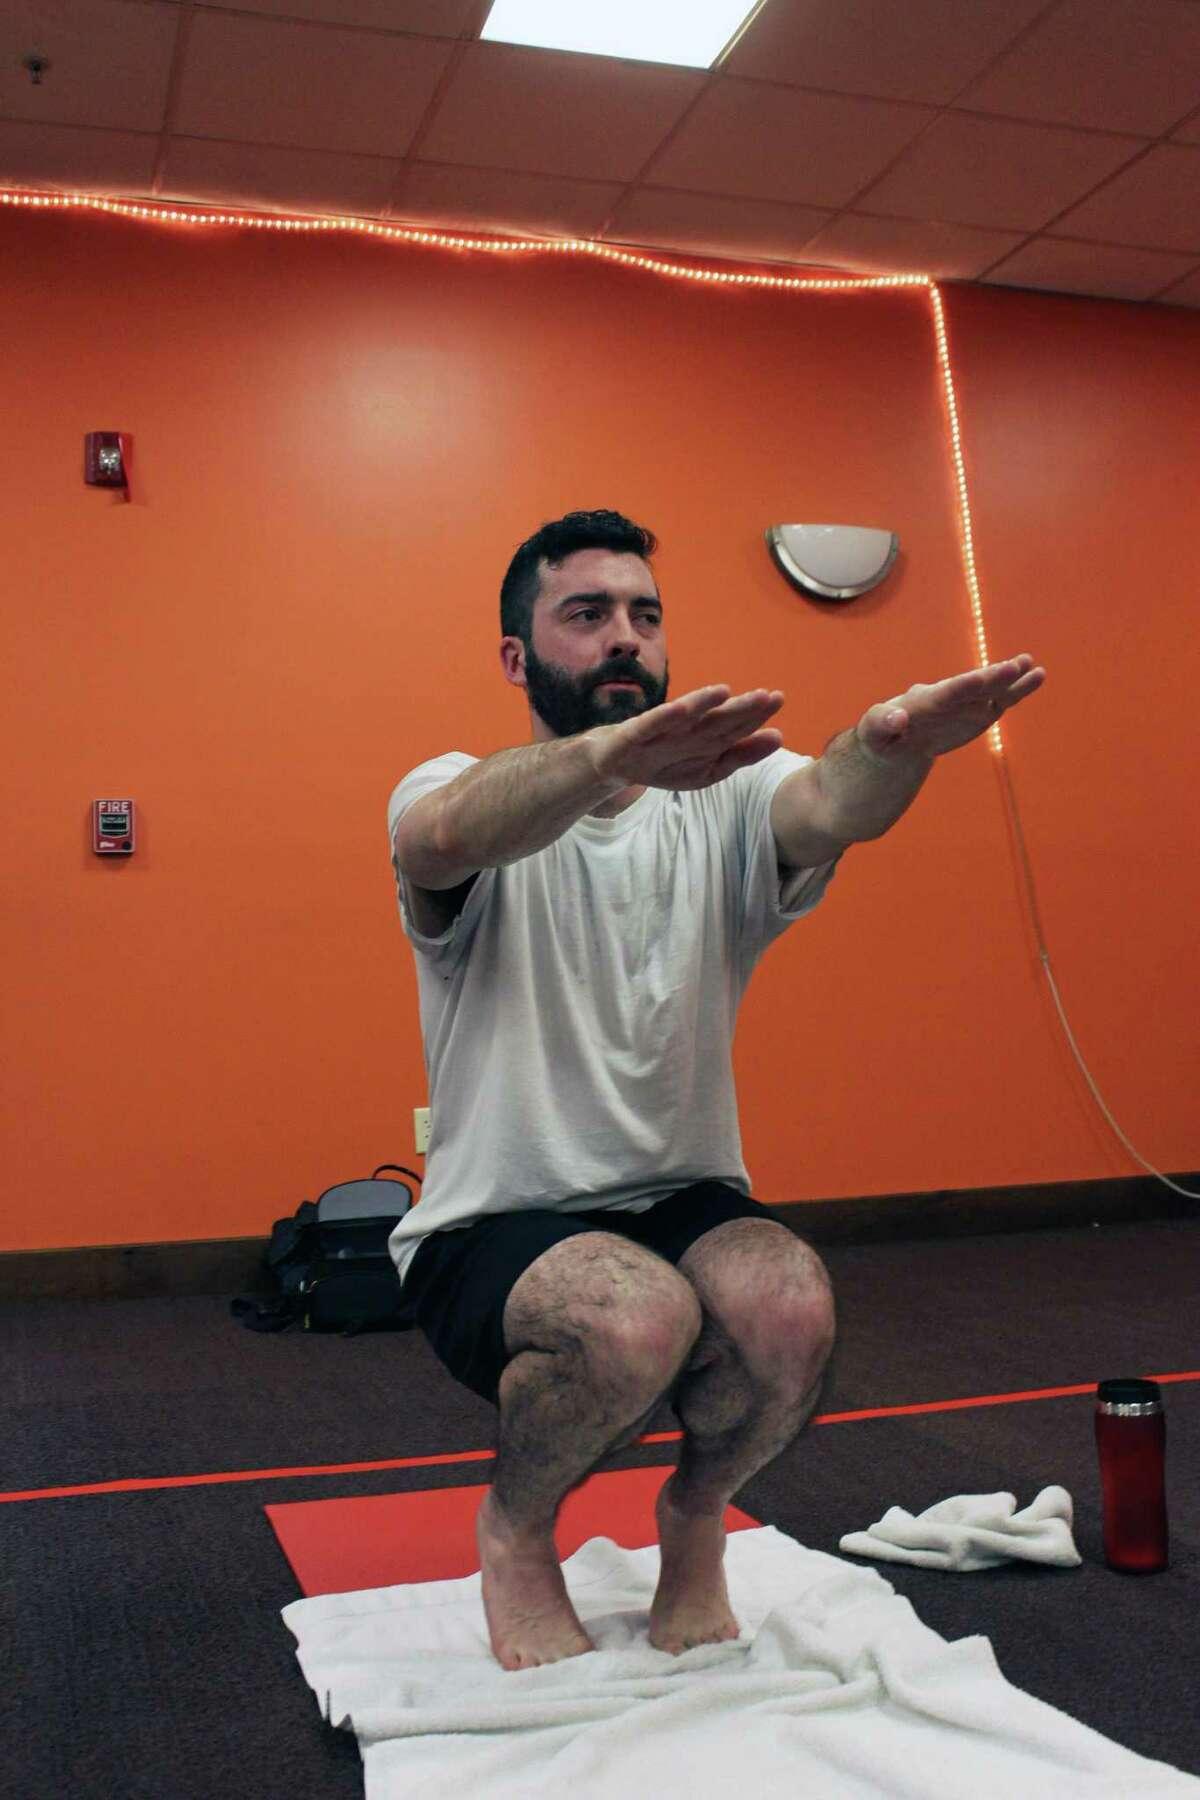 Hearst Connecticut reporter Justin Papp at Fairfield Hot Yoga in Fairfield, Conn., Feb. 26, 2018.